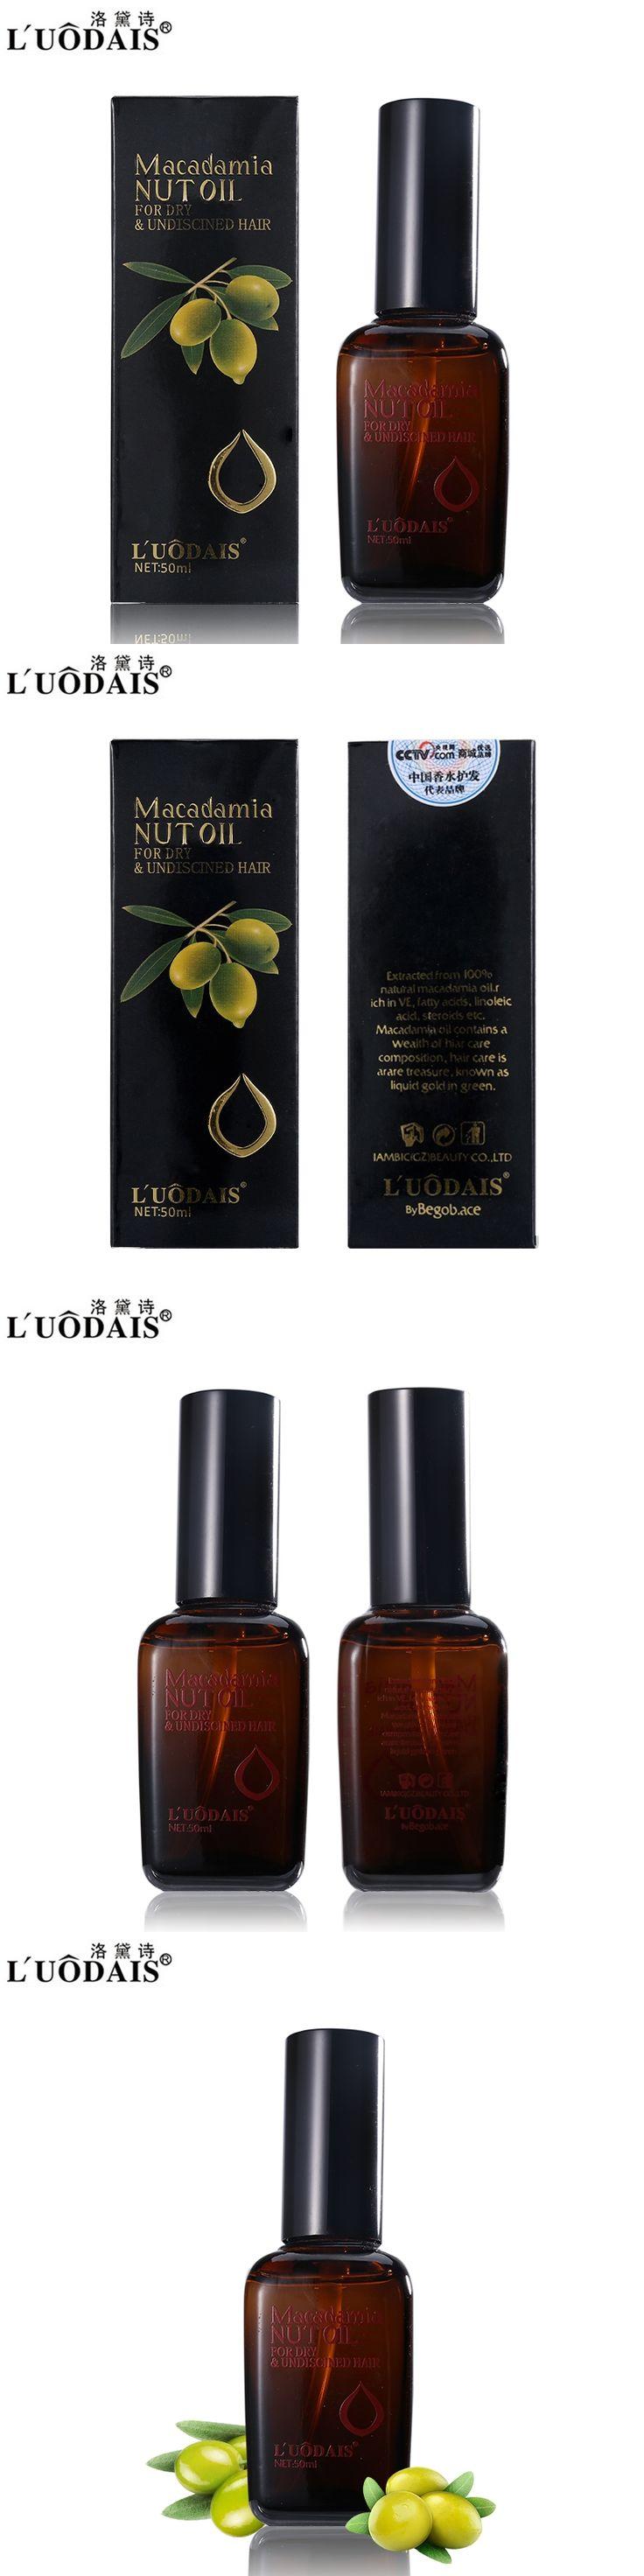 LUODAIS Brand Hair Care Hair & Scalp Treatment 100% Pure Moroccan Argan Oil Macadamia Nut Oil for Dry and Damaged Hair